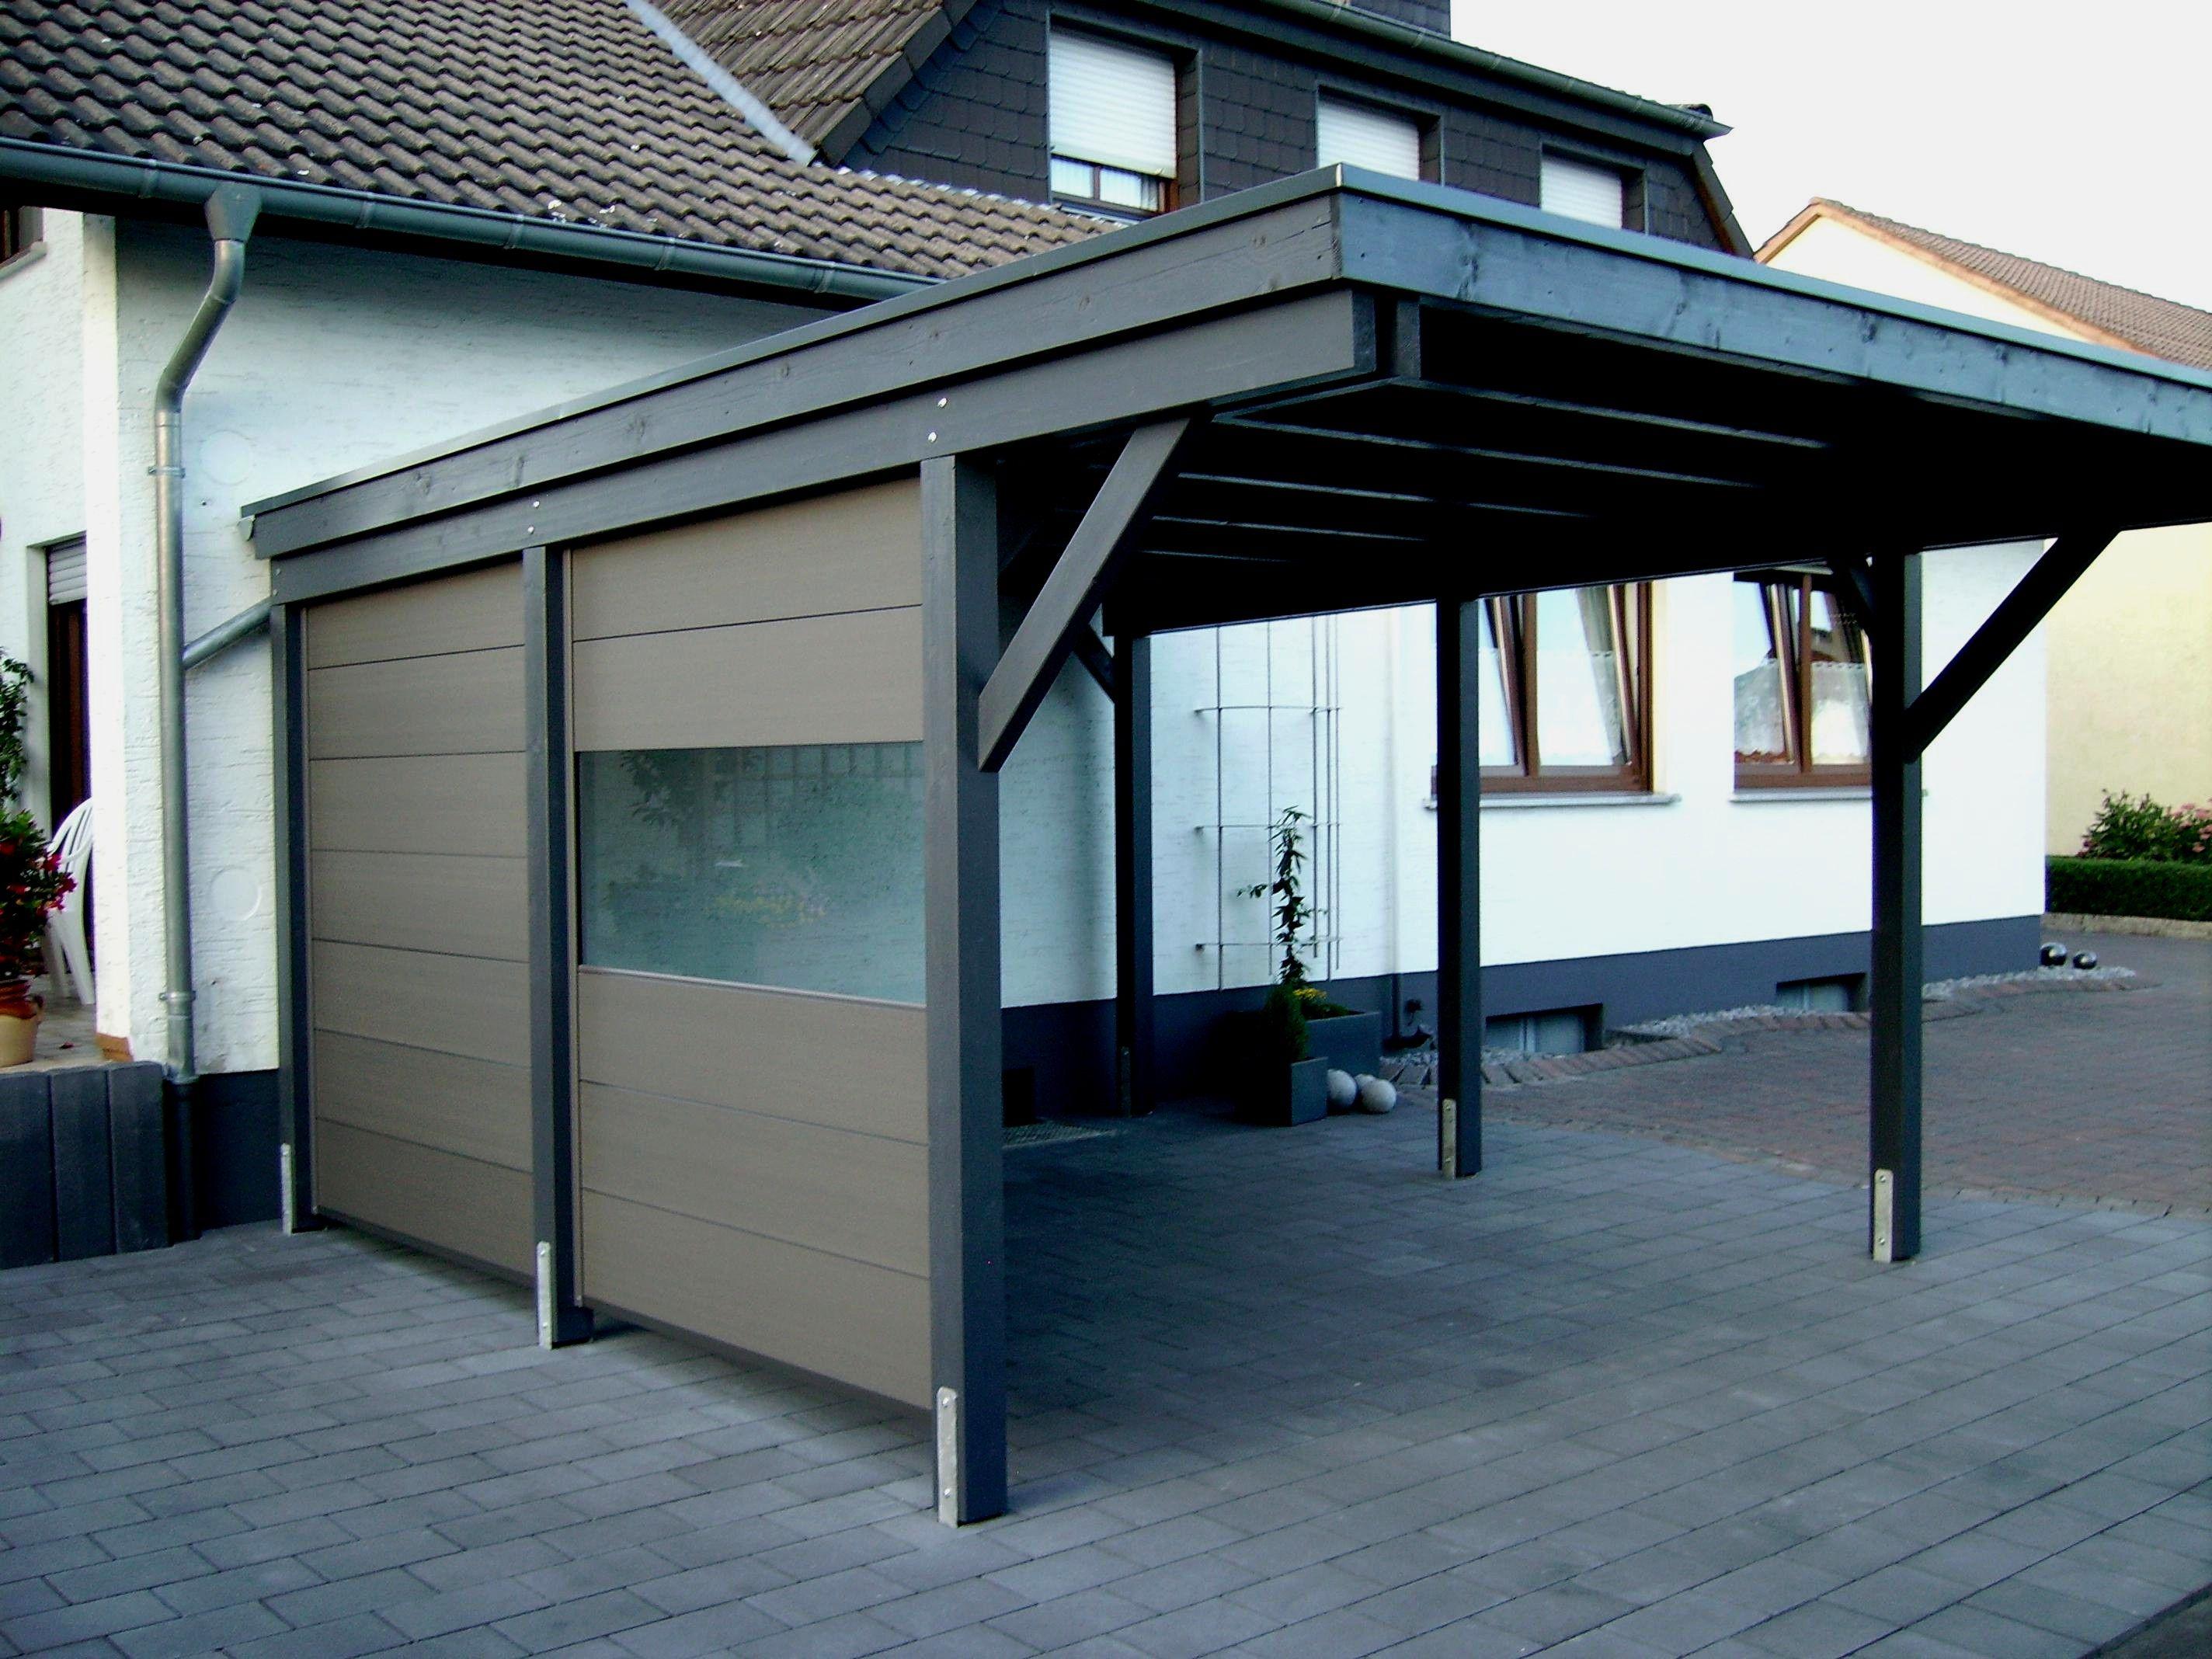 49 Design Zum Carport Verkleiden Mit Osb Platten Outdoor Decor Carport House